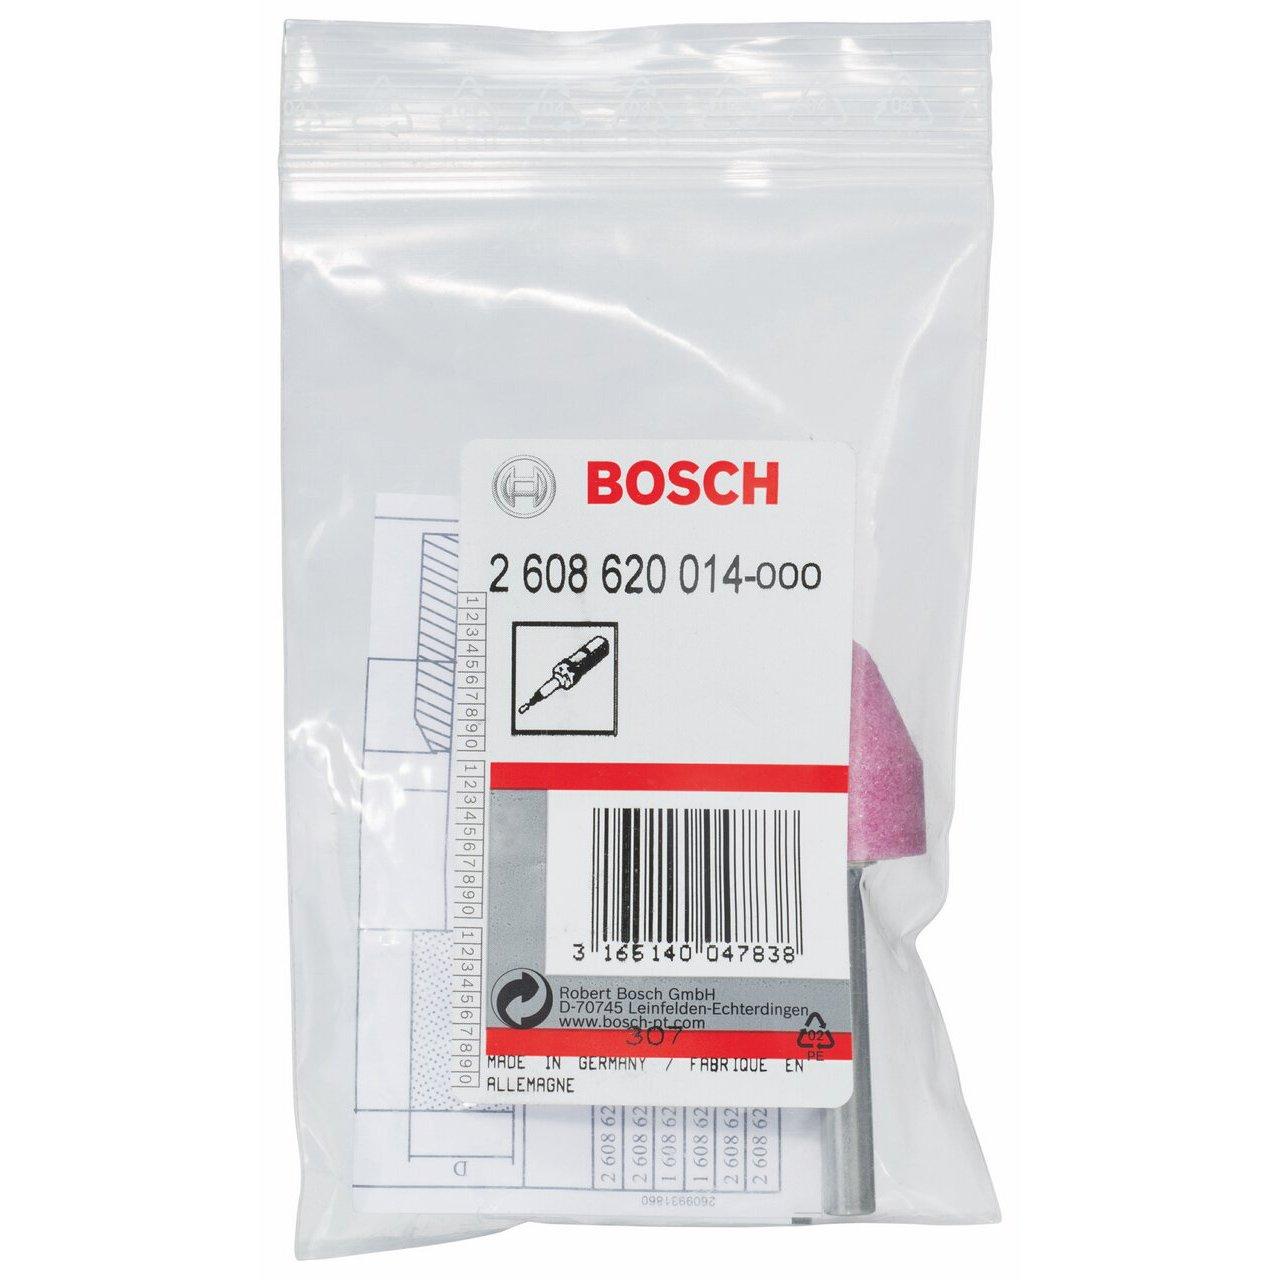 Medium-Hard 6 mm 20 mm 60 conical 25 mm Bosch 2608620014 Grinding Stone